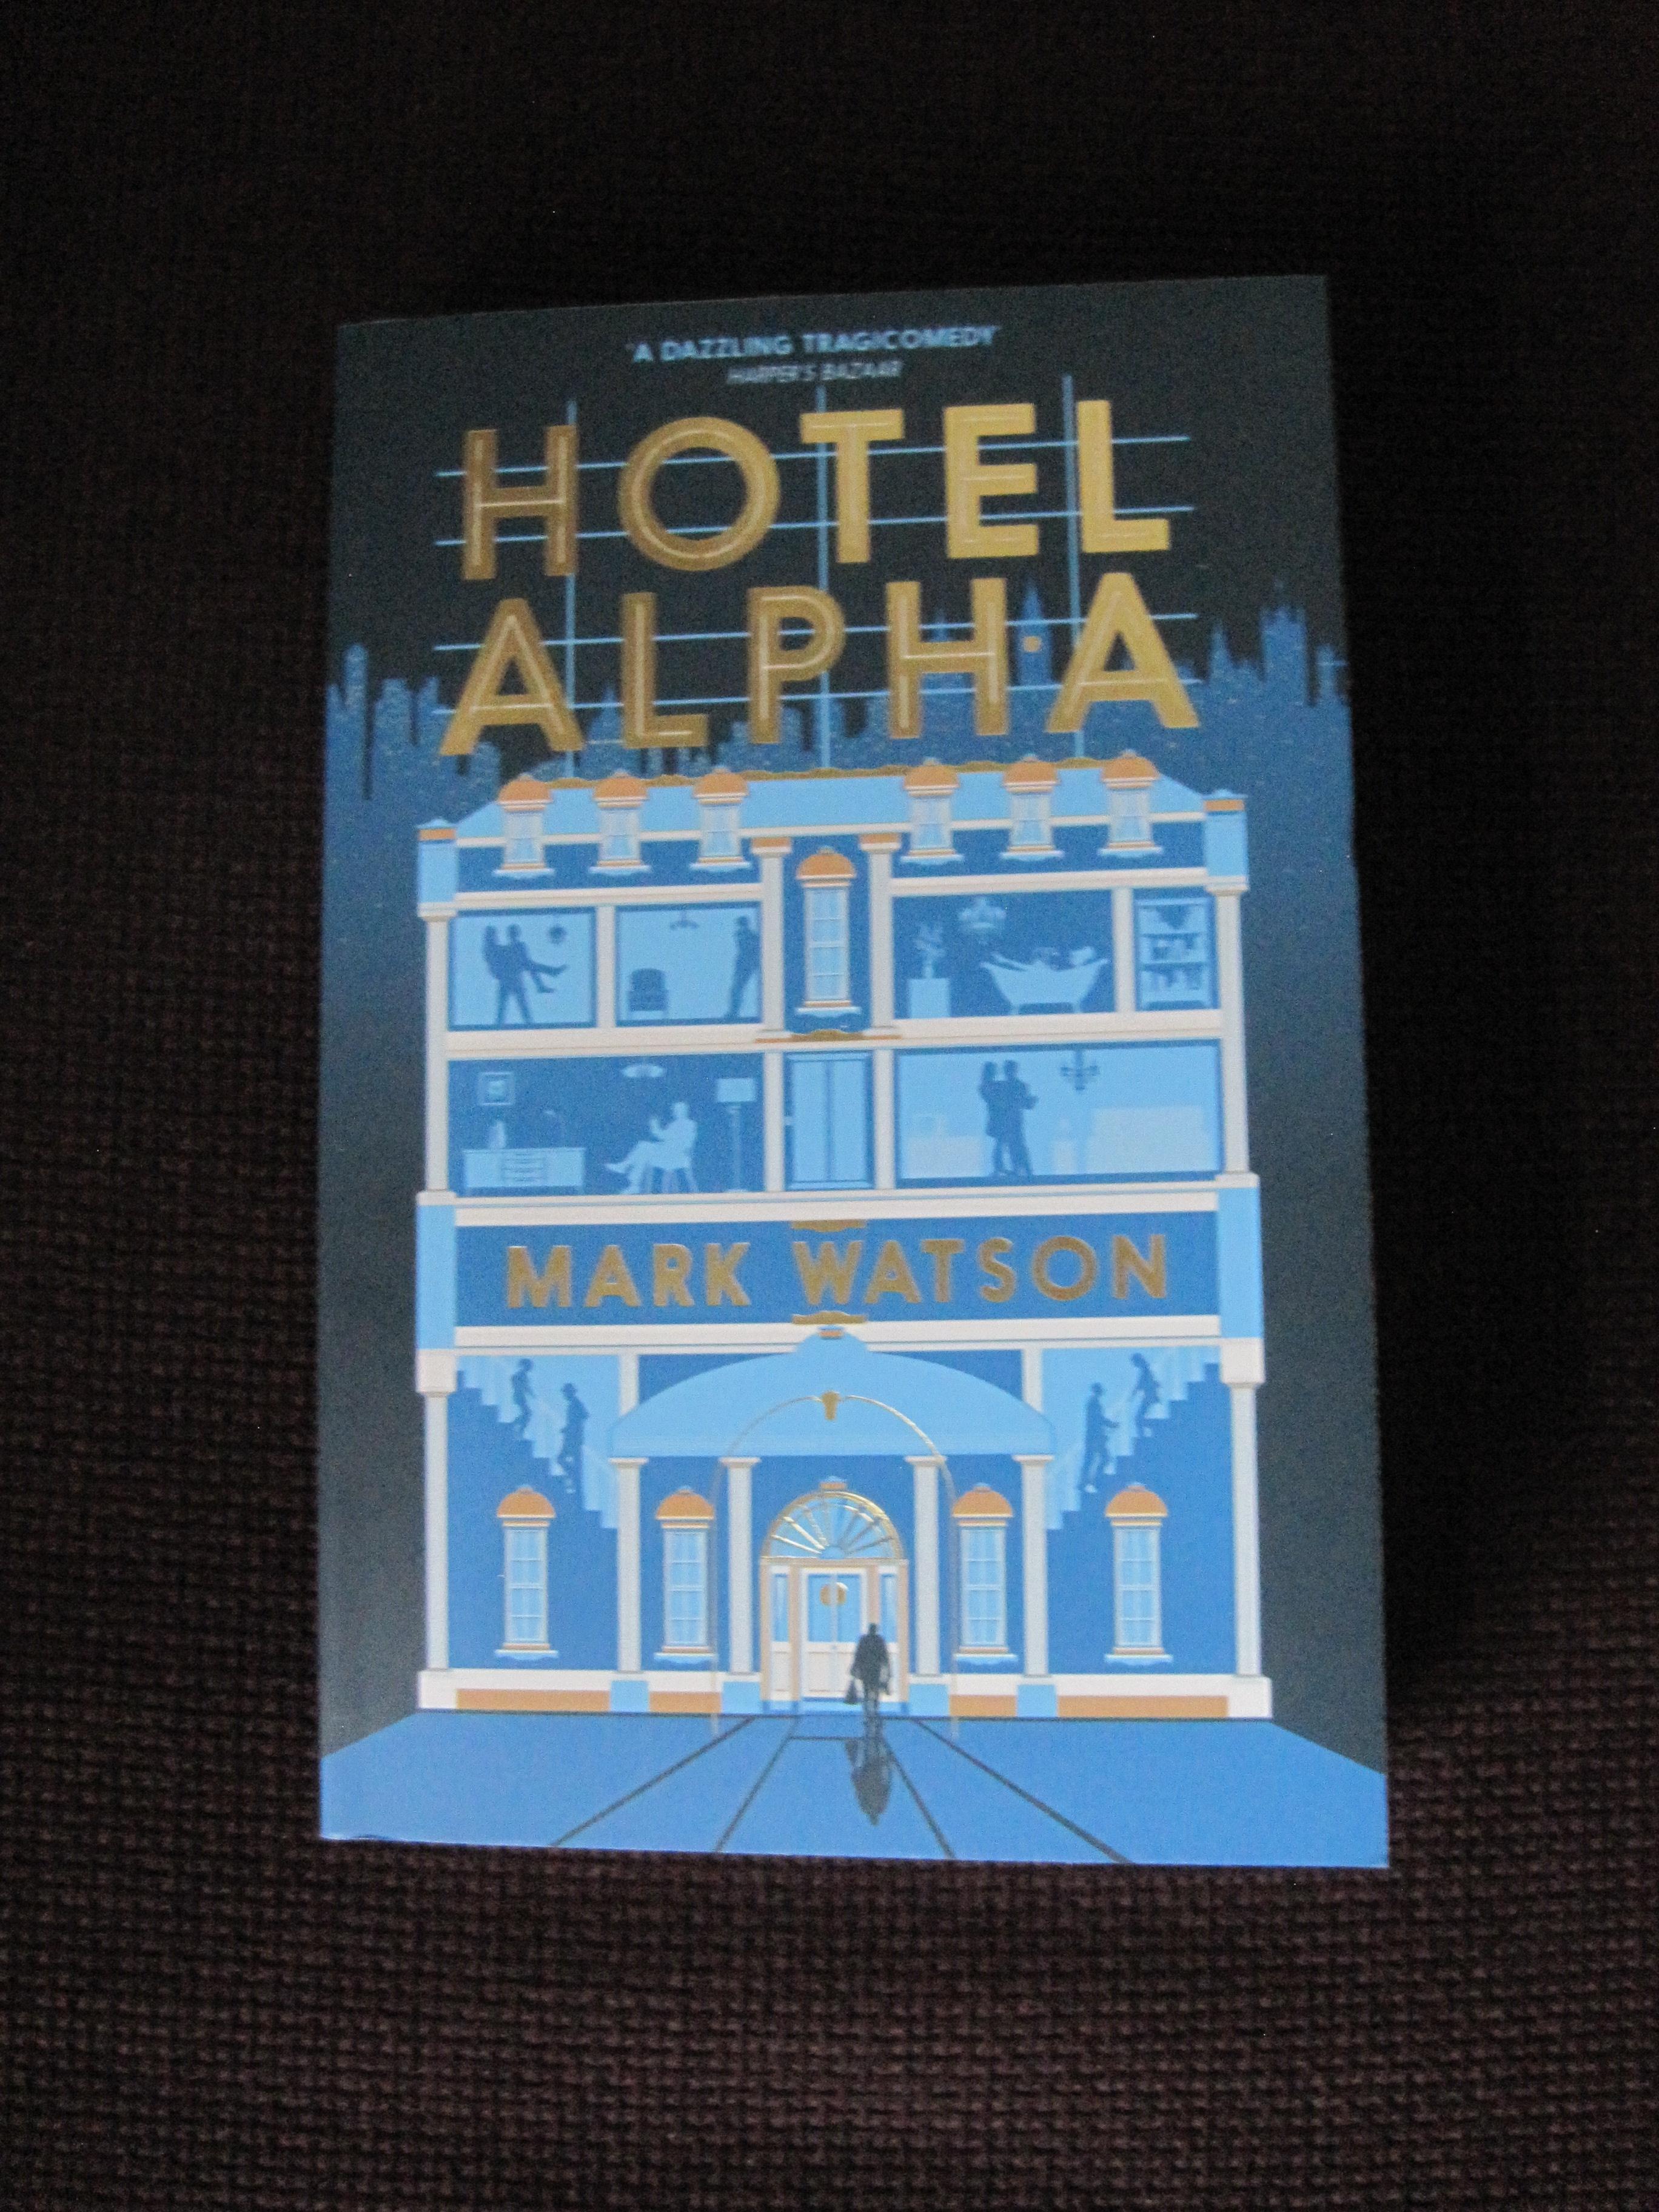 Hotel Alpha - photo by Juliamaud